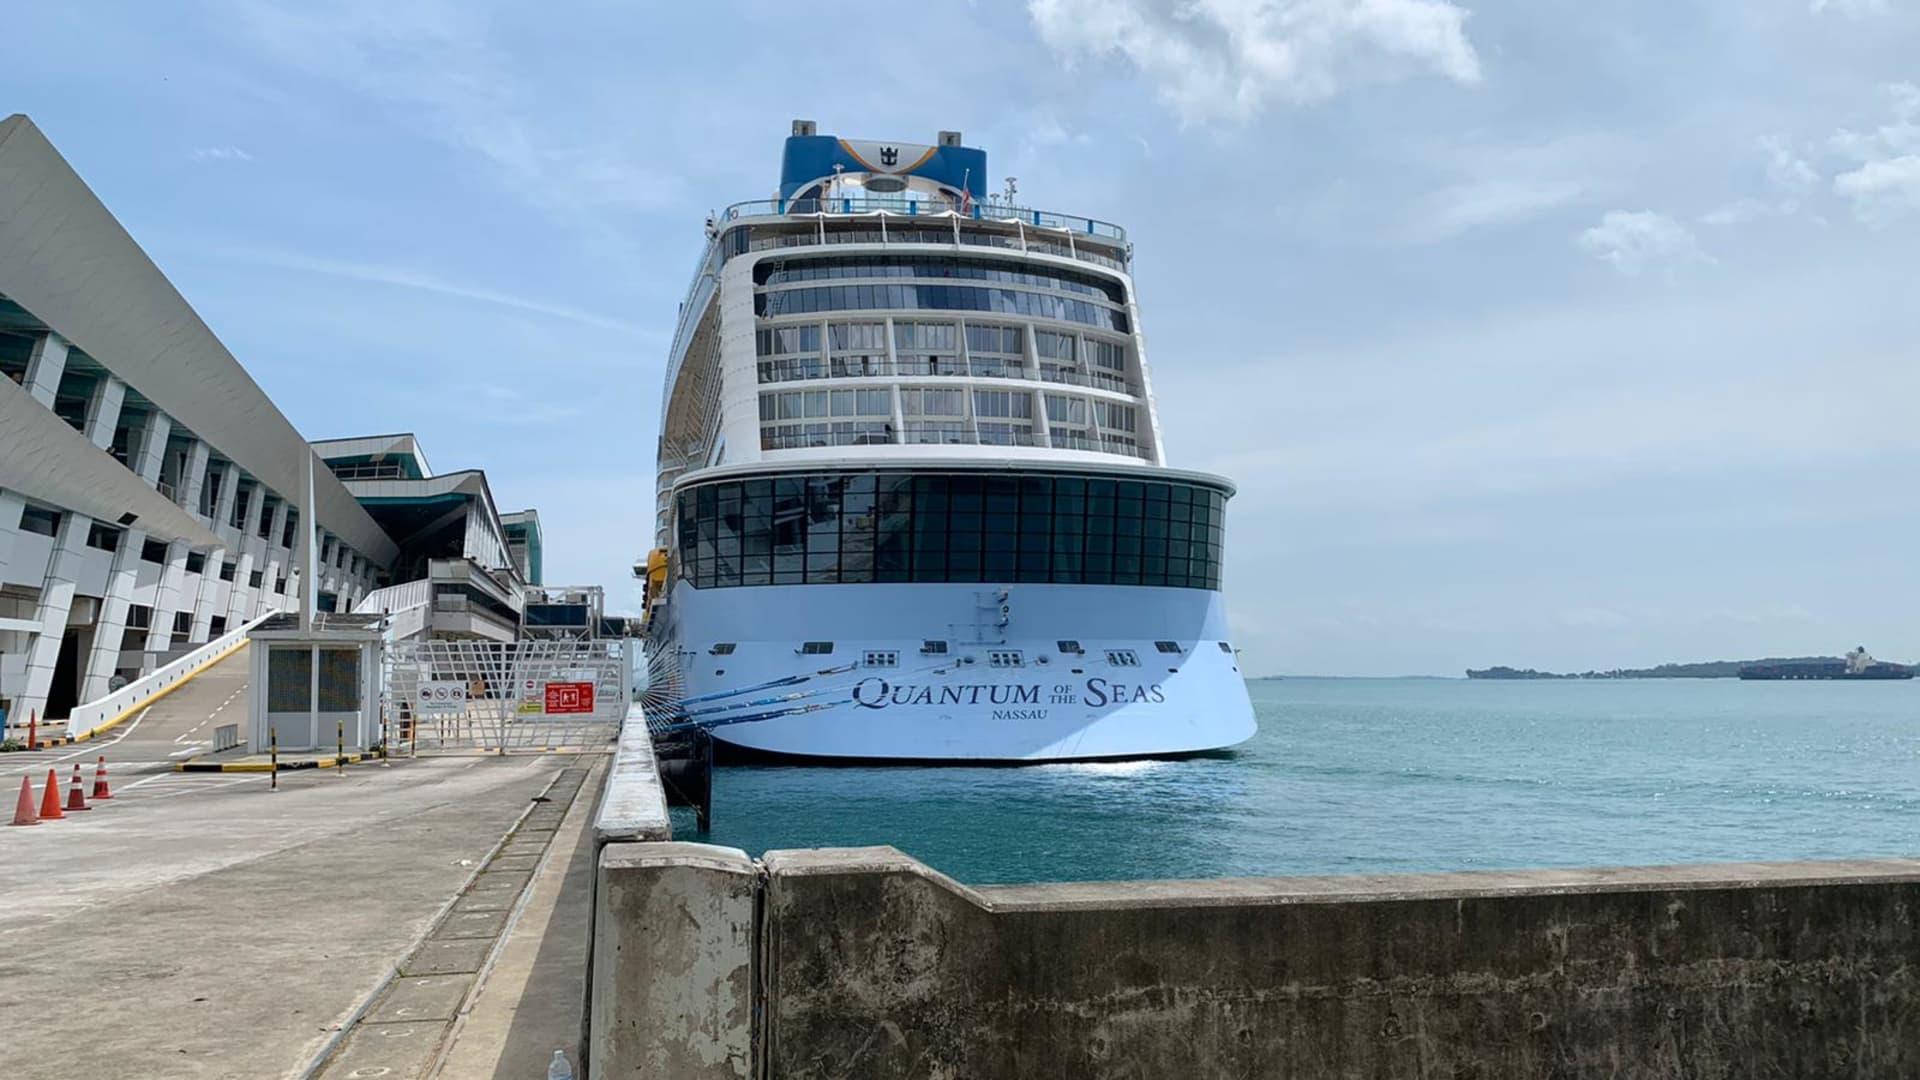 Royal Caribbean's Quantum of the Seas cruise ship docked at Singapore's Marina Bay Cruise Centre on Dec. 9, 2020.